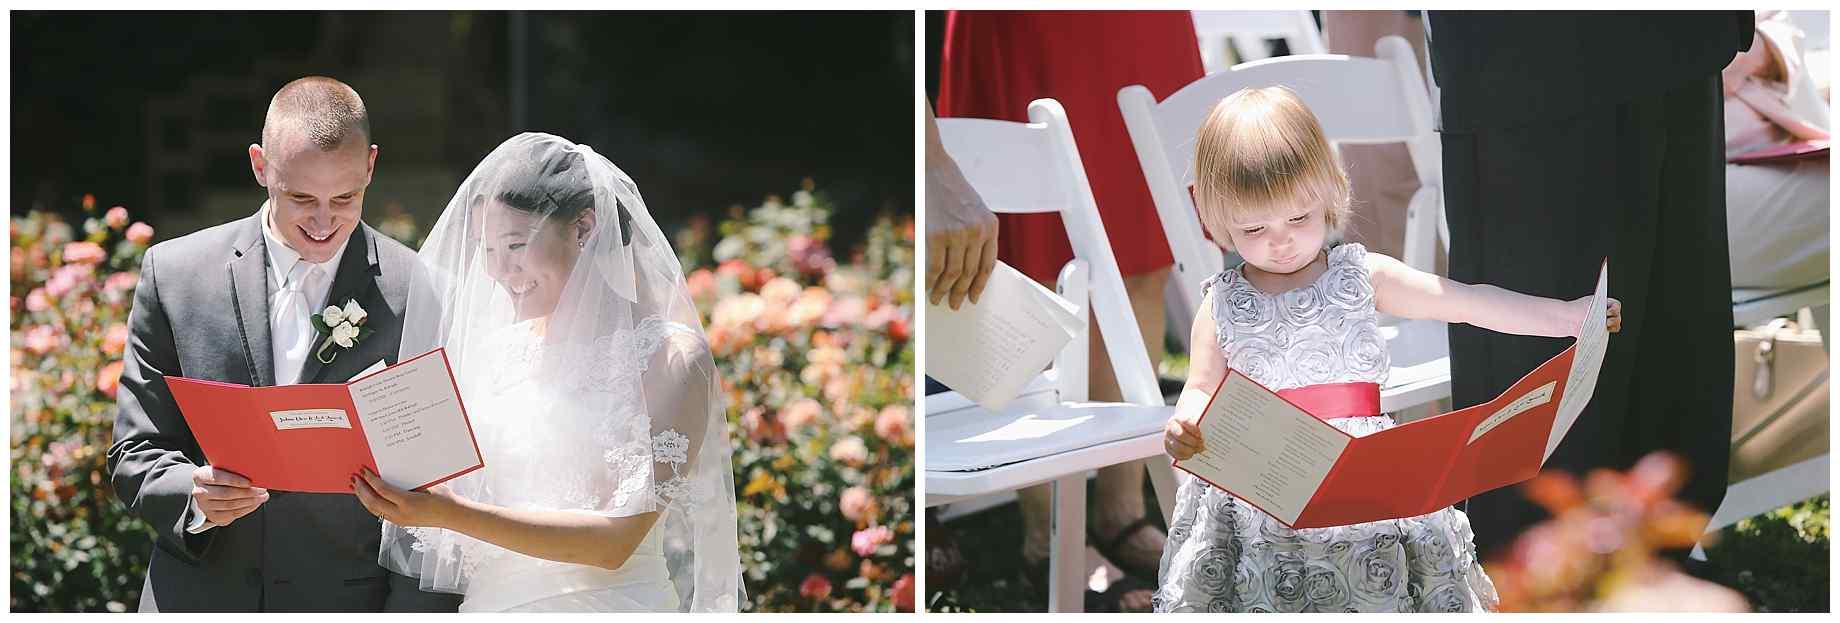 harvard-wedding-photography-12